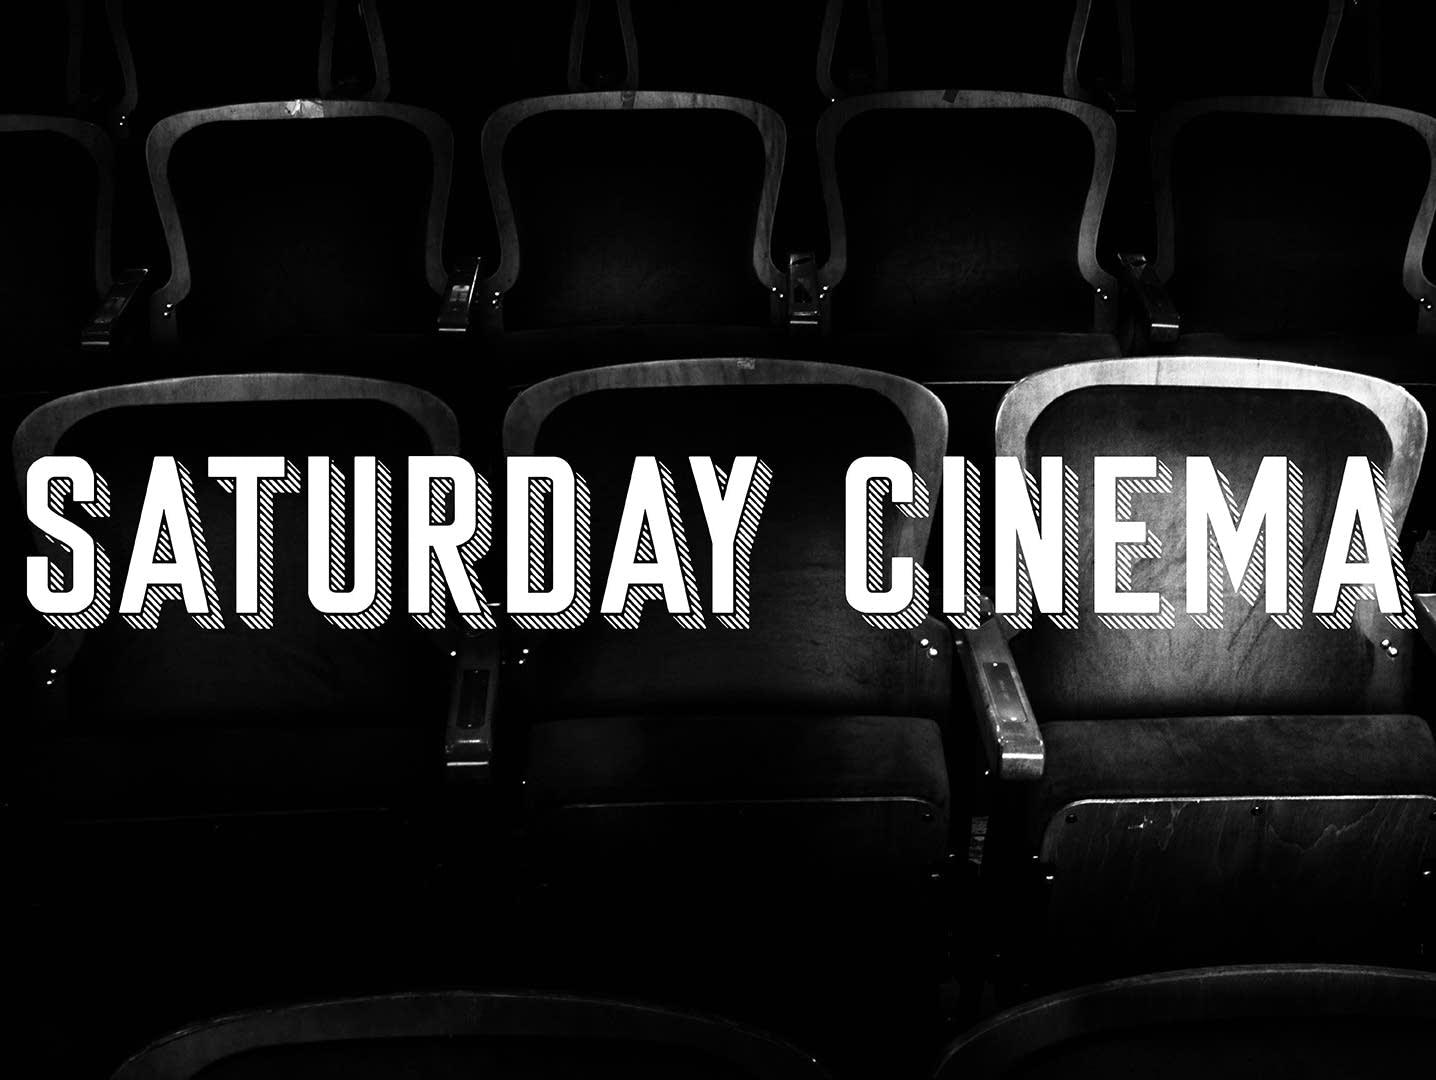 Saturday Cinema theater seats